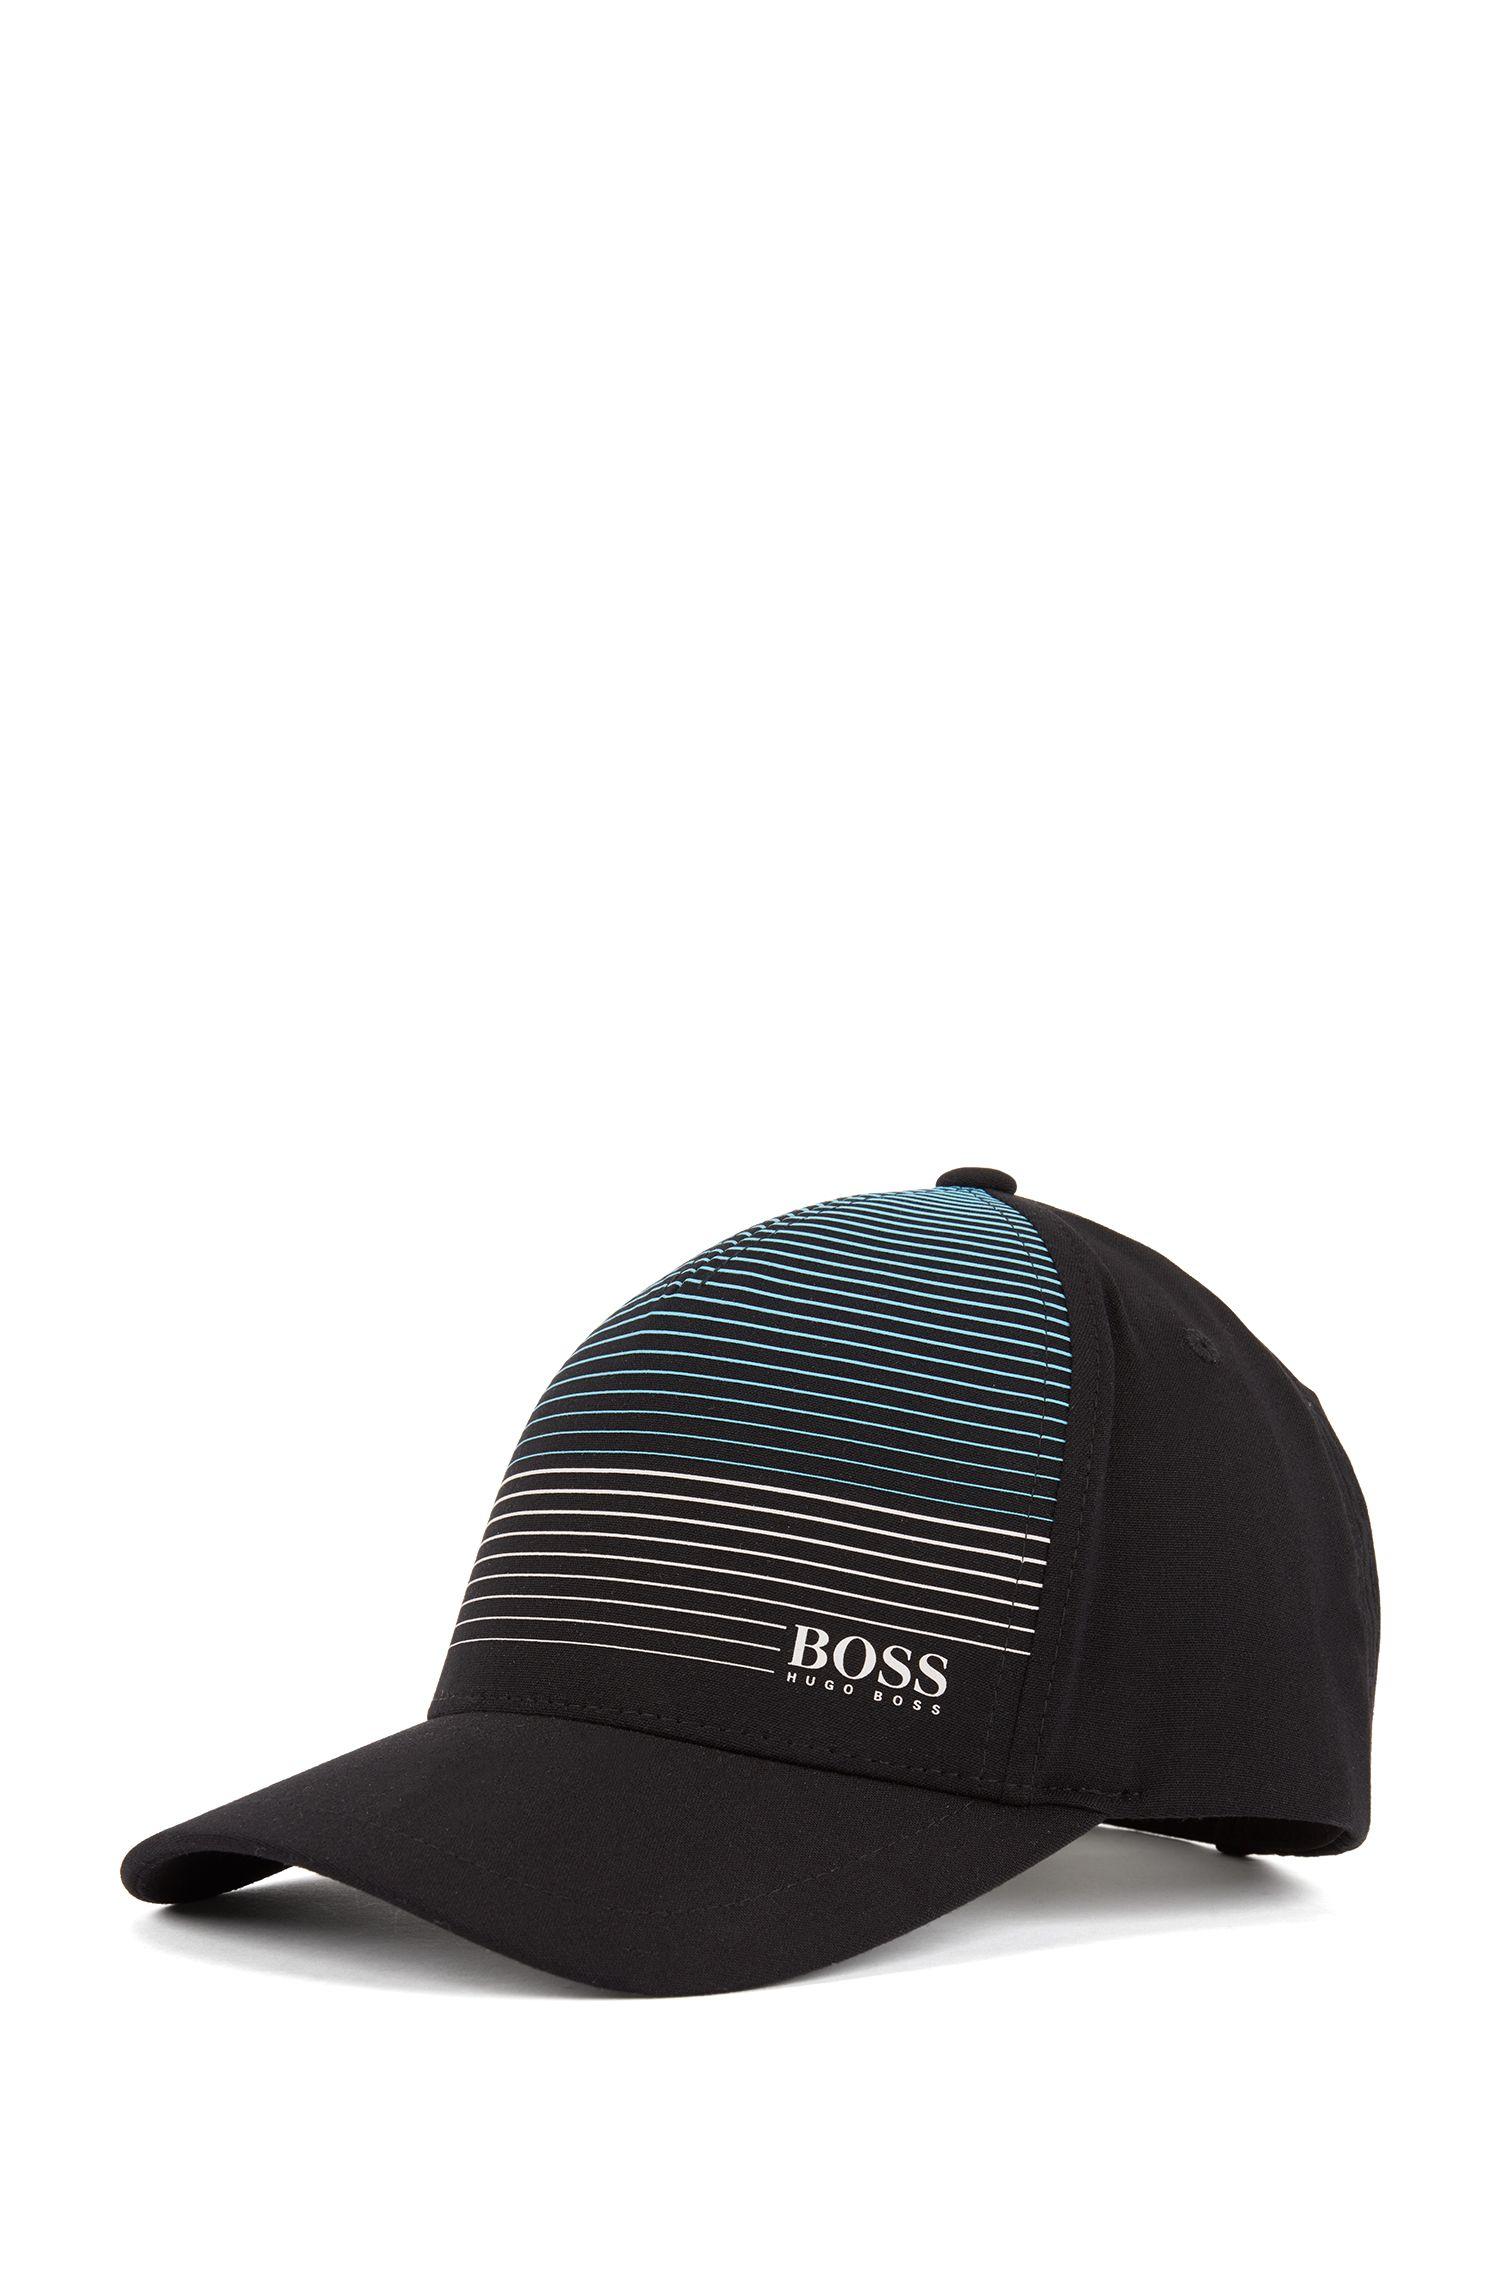 Adjustable cap in stretch melange with rubberised stripe pattern, Black